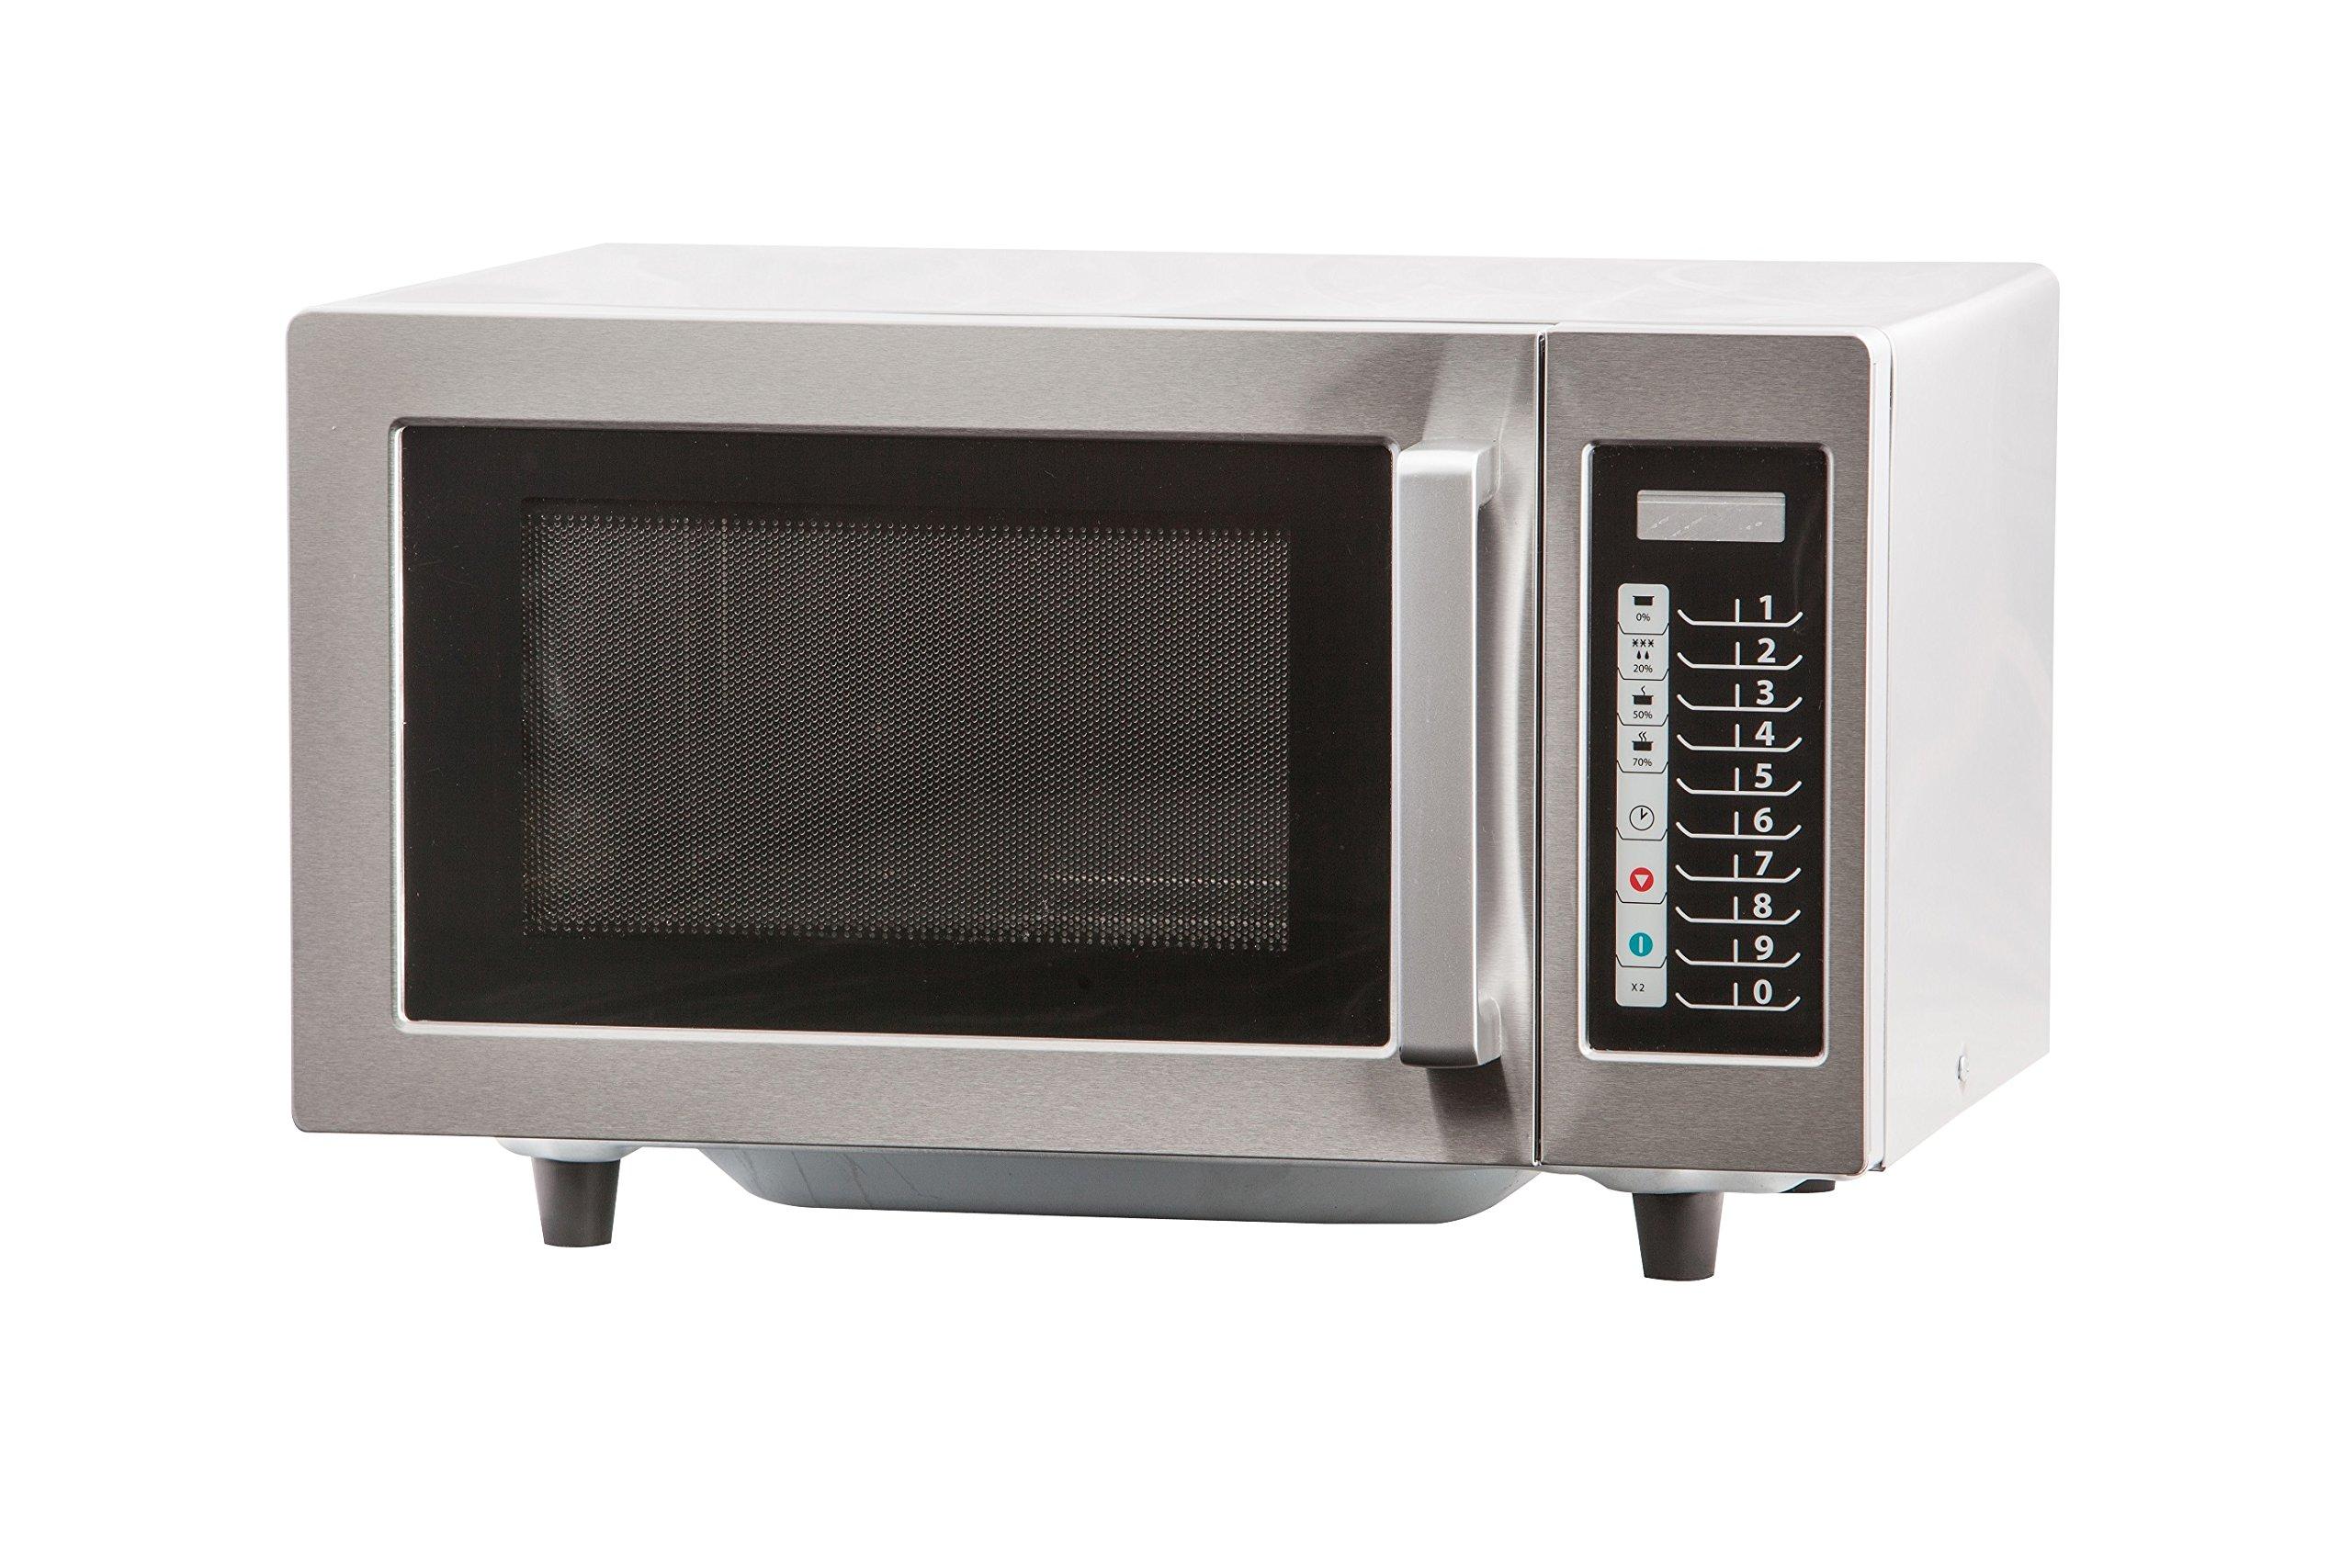 Amana RMS10TS Medium Volume Microwave Oven, 1000W